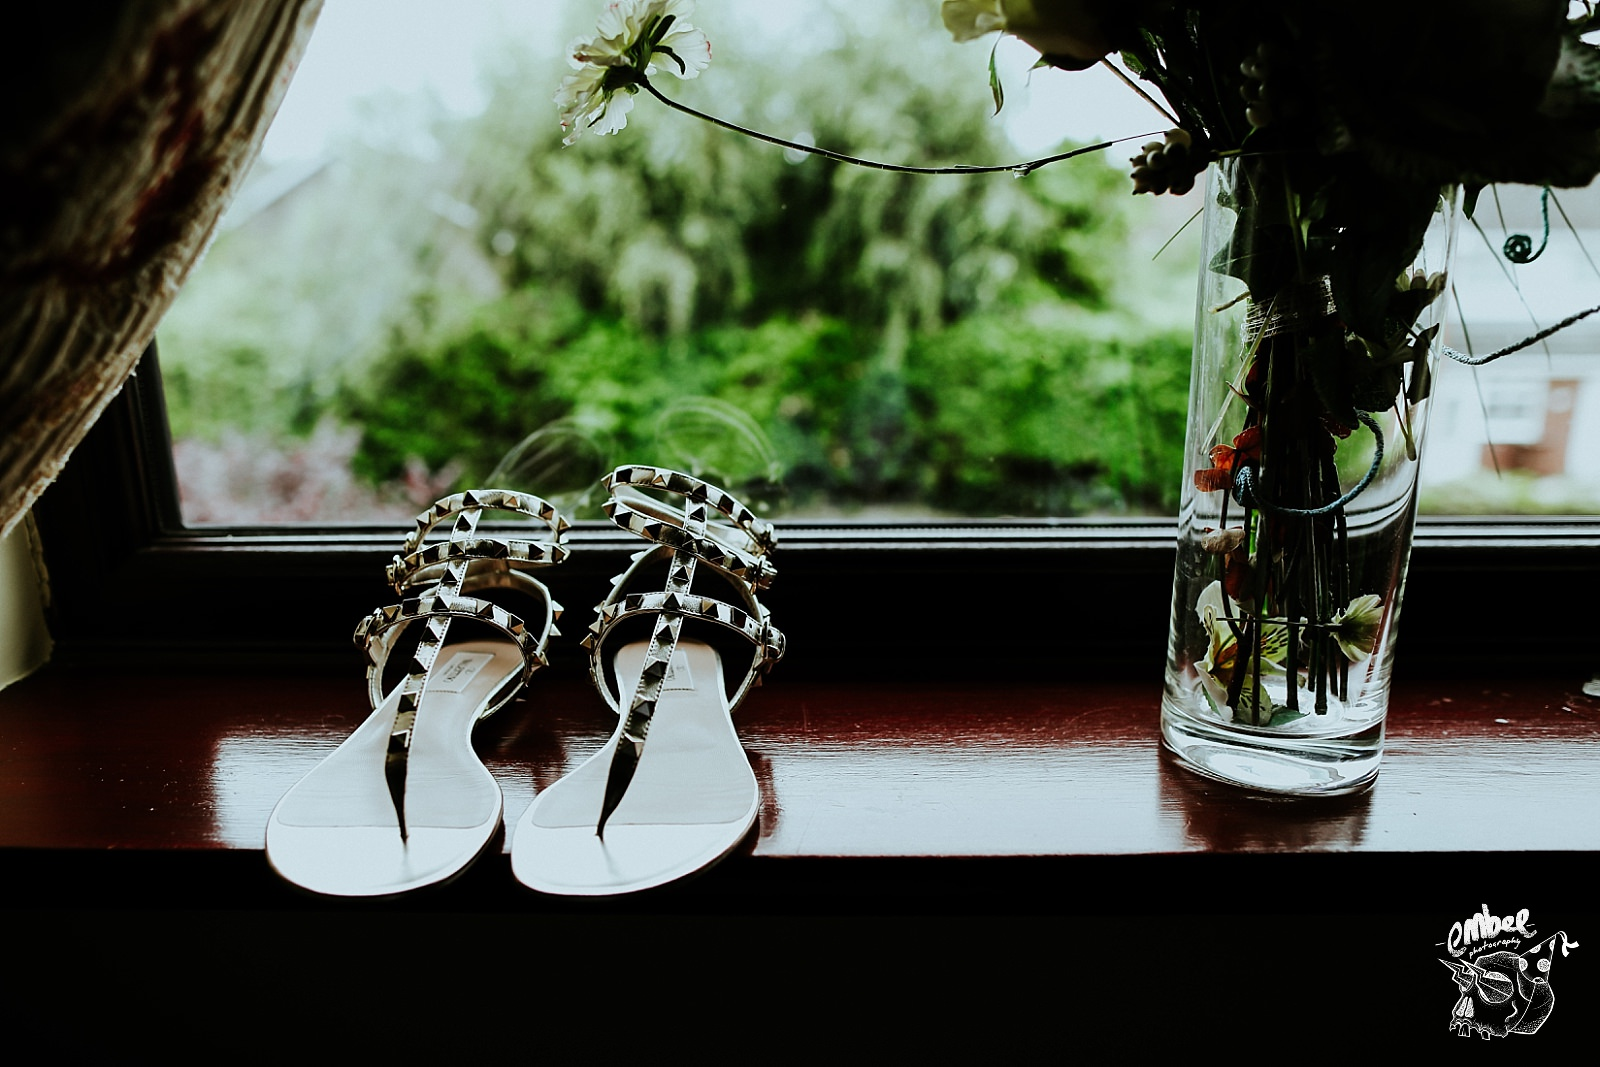 brides shoes on window ledge